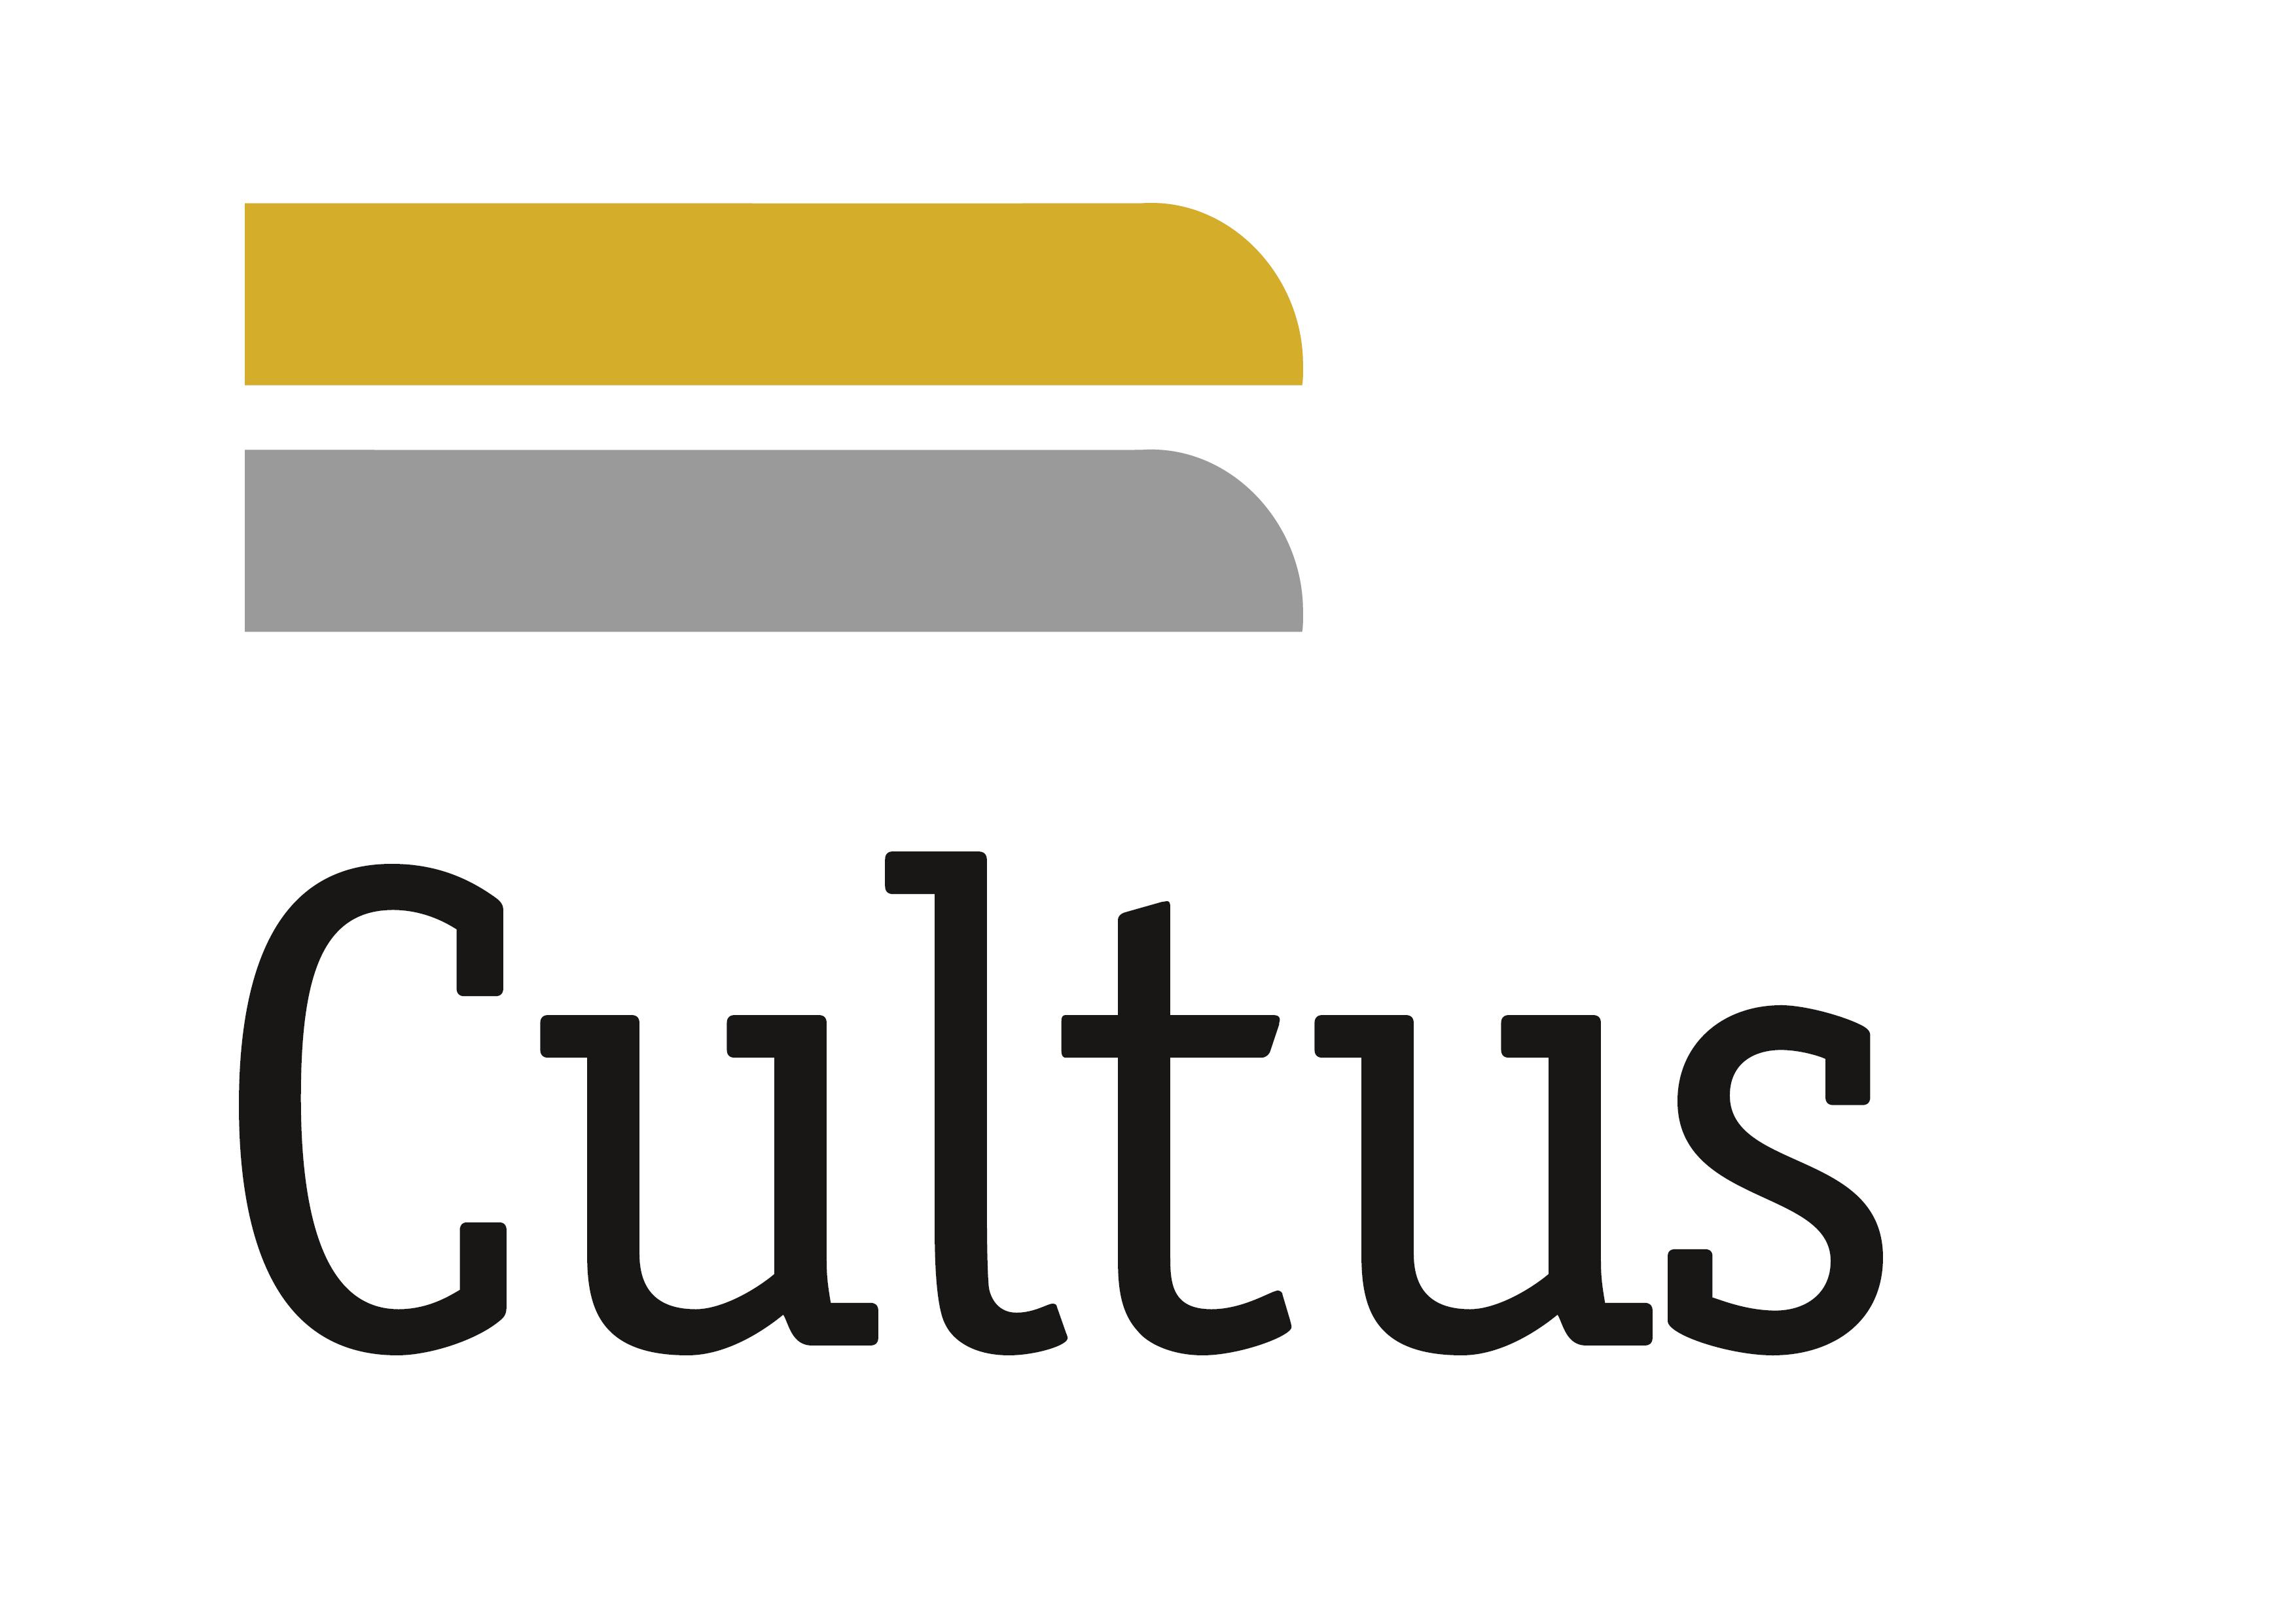 A38_Cultus_logo.jpg